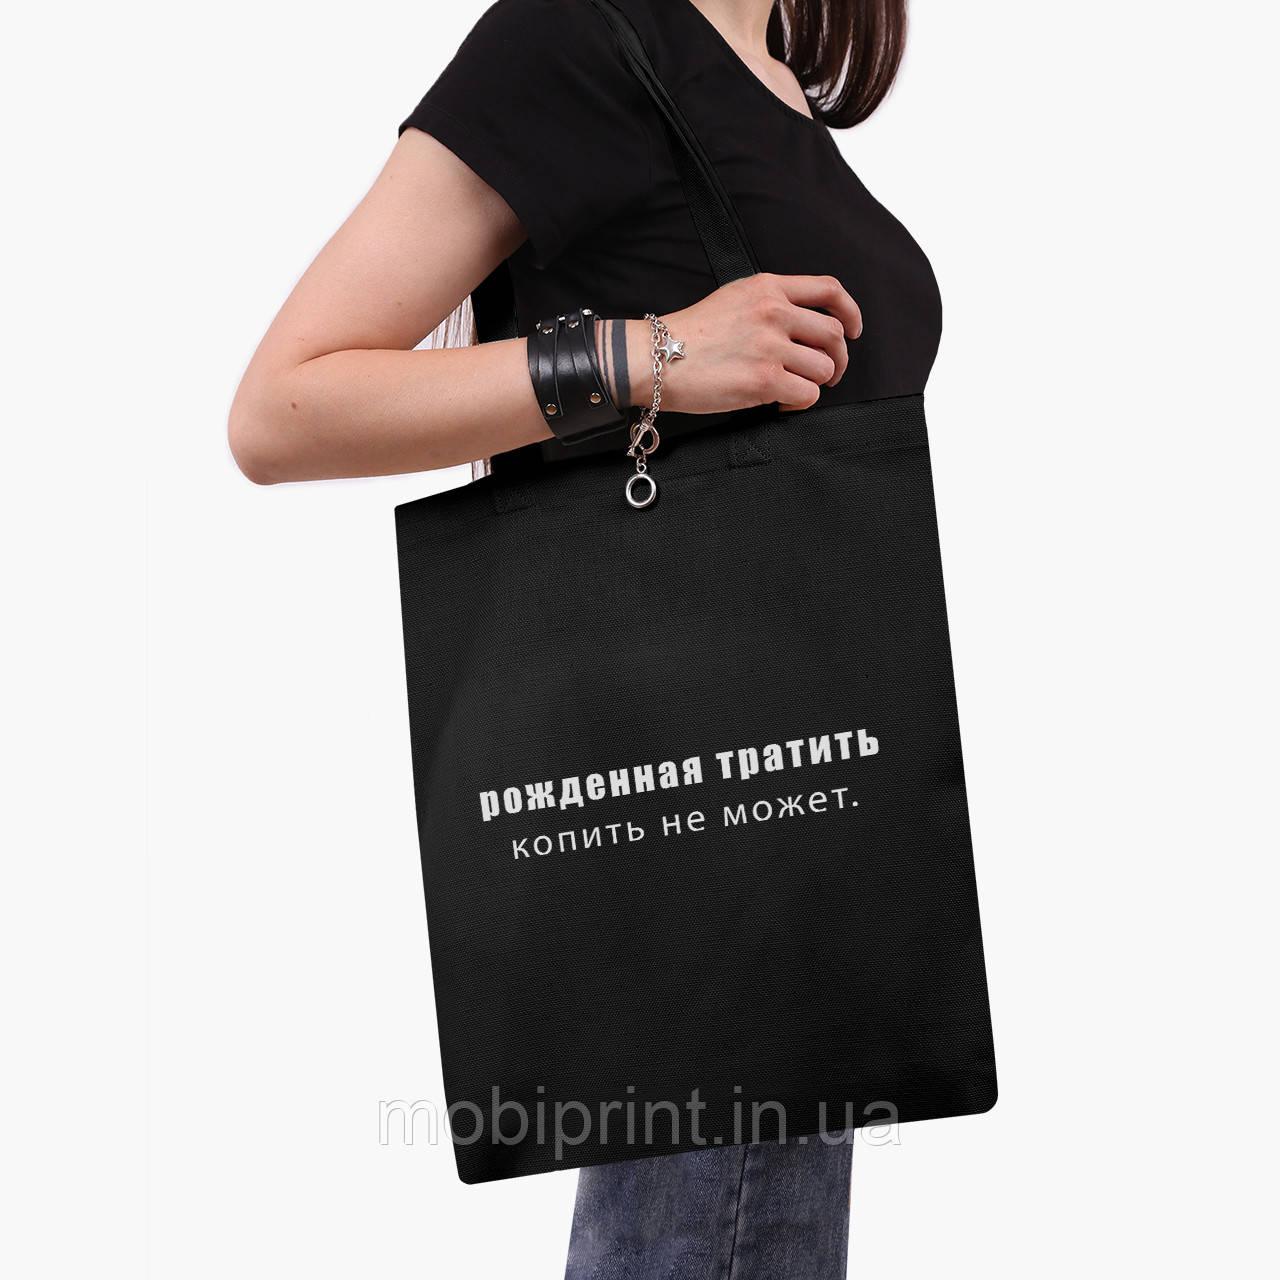 Еко сумка шоппер чорна Народжена витрачати збирати не може (9227-1789-2) экосумка шопер 41*35 см